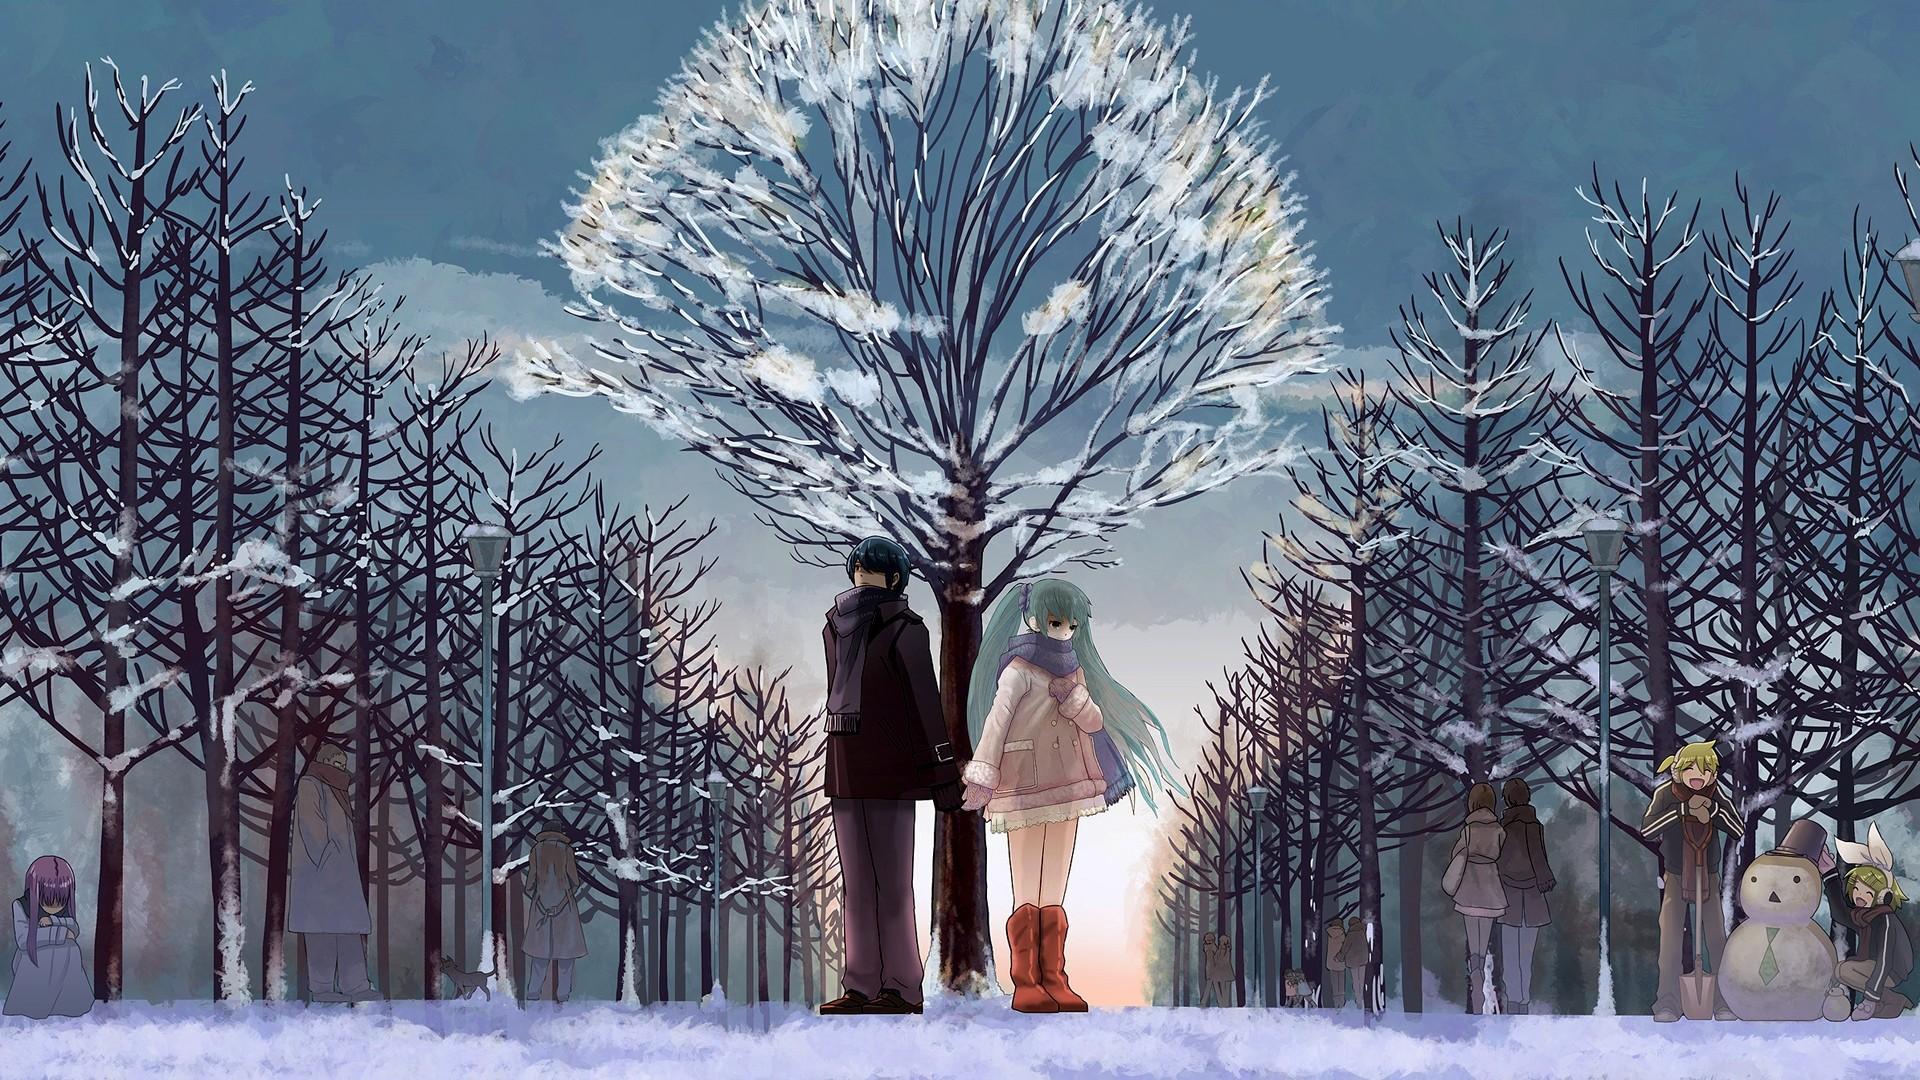 Sweet Anime Couples Wallpaper – Free Desktop Wallpapers, Wallpapers for  FREE in High Quality Resolutions